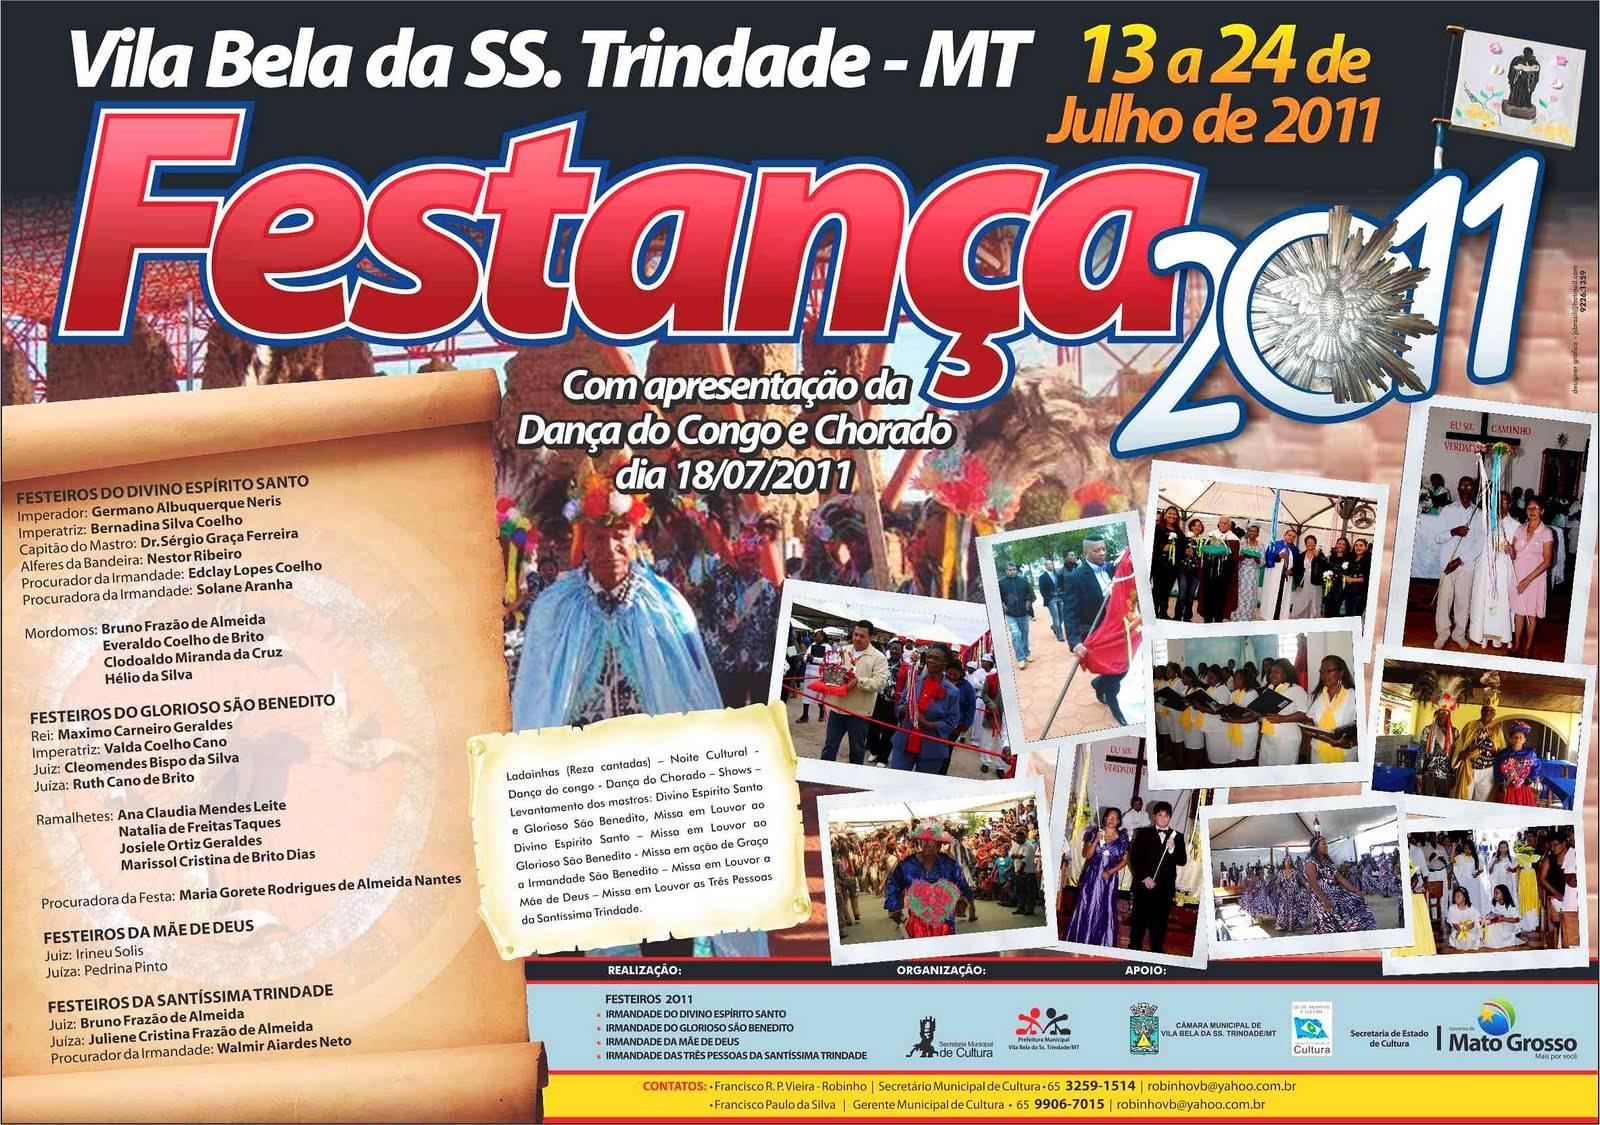 Vila Bela Cartaz 2011 - Fto 2